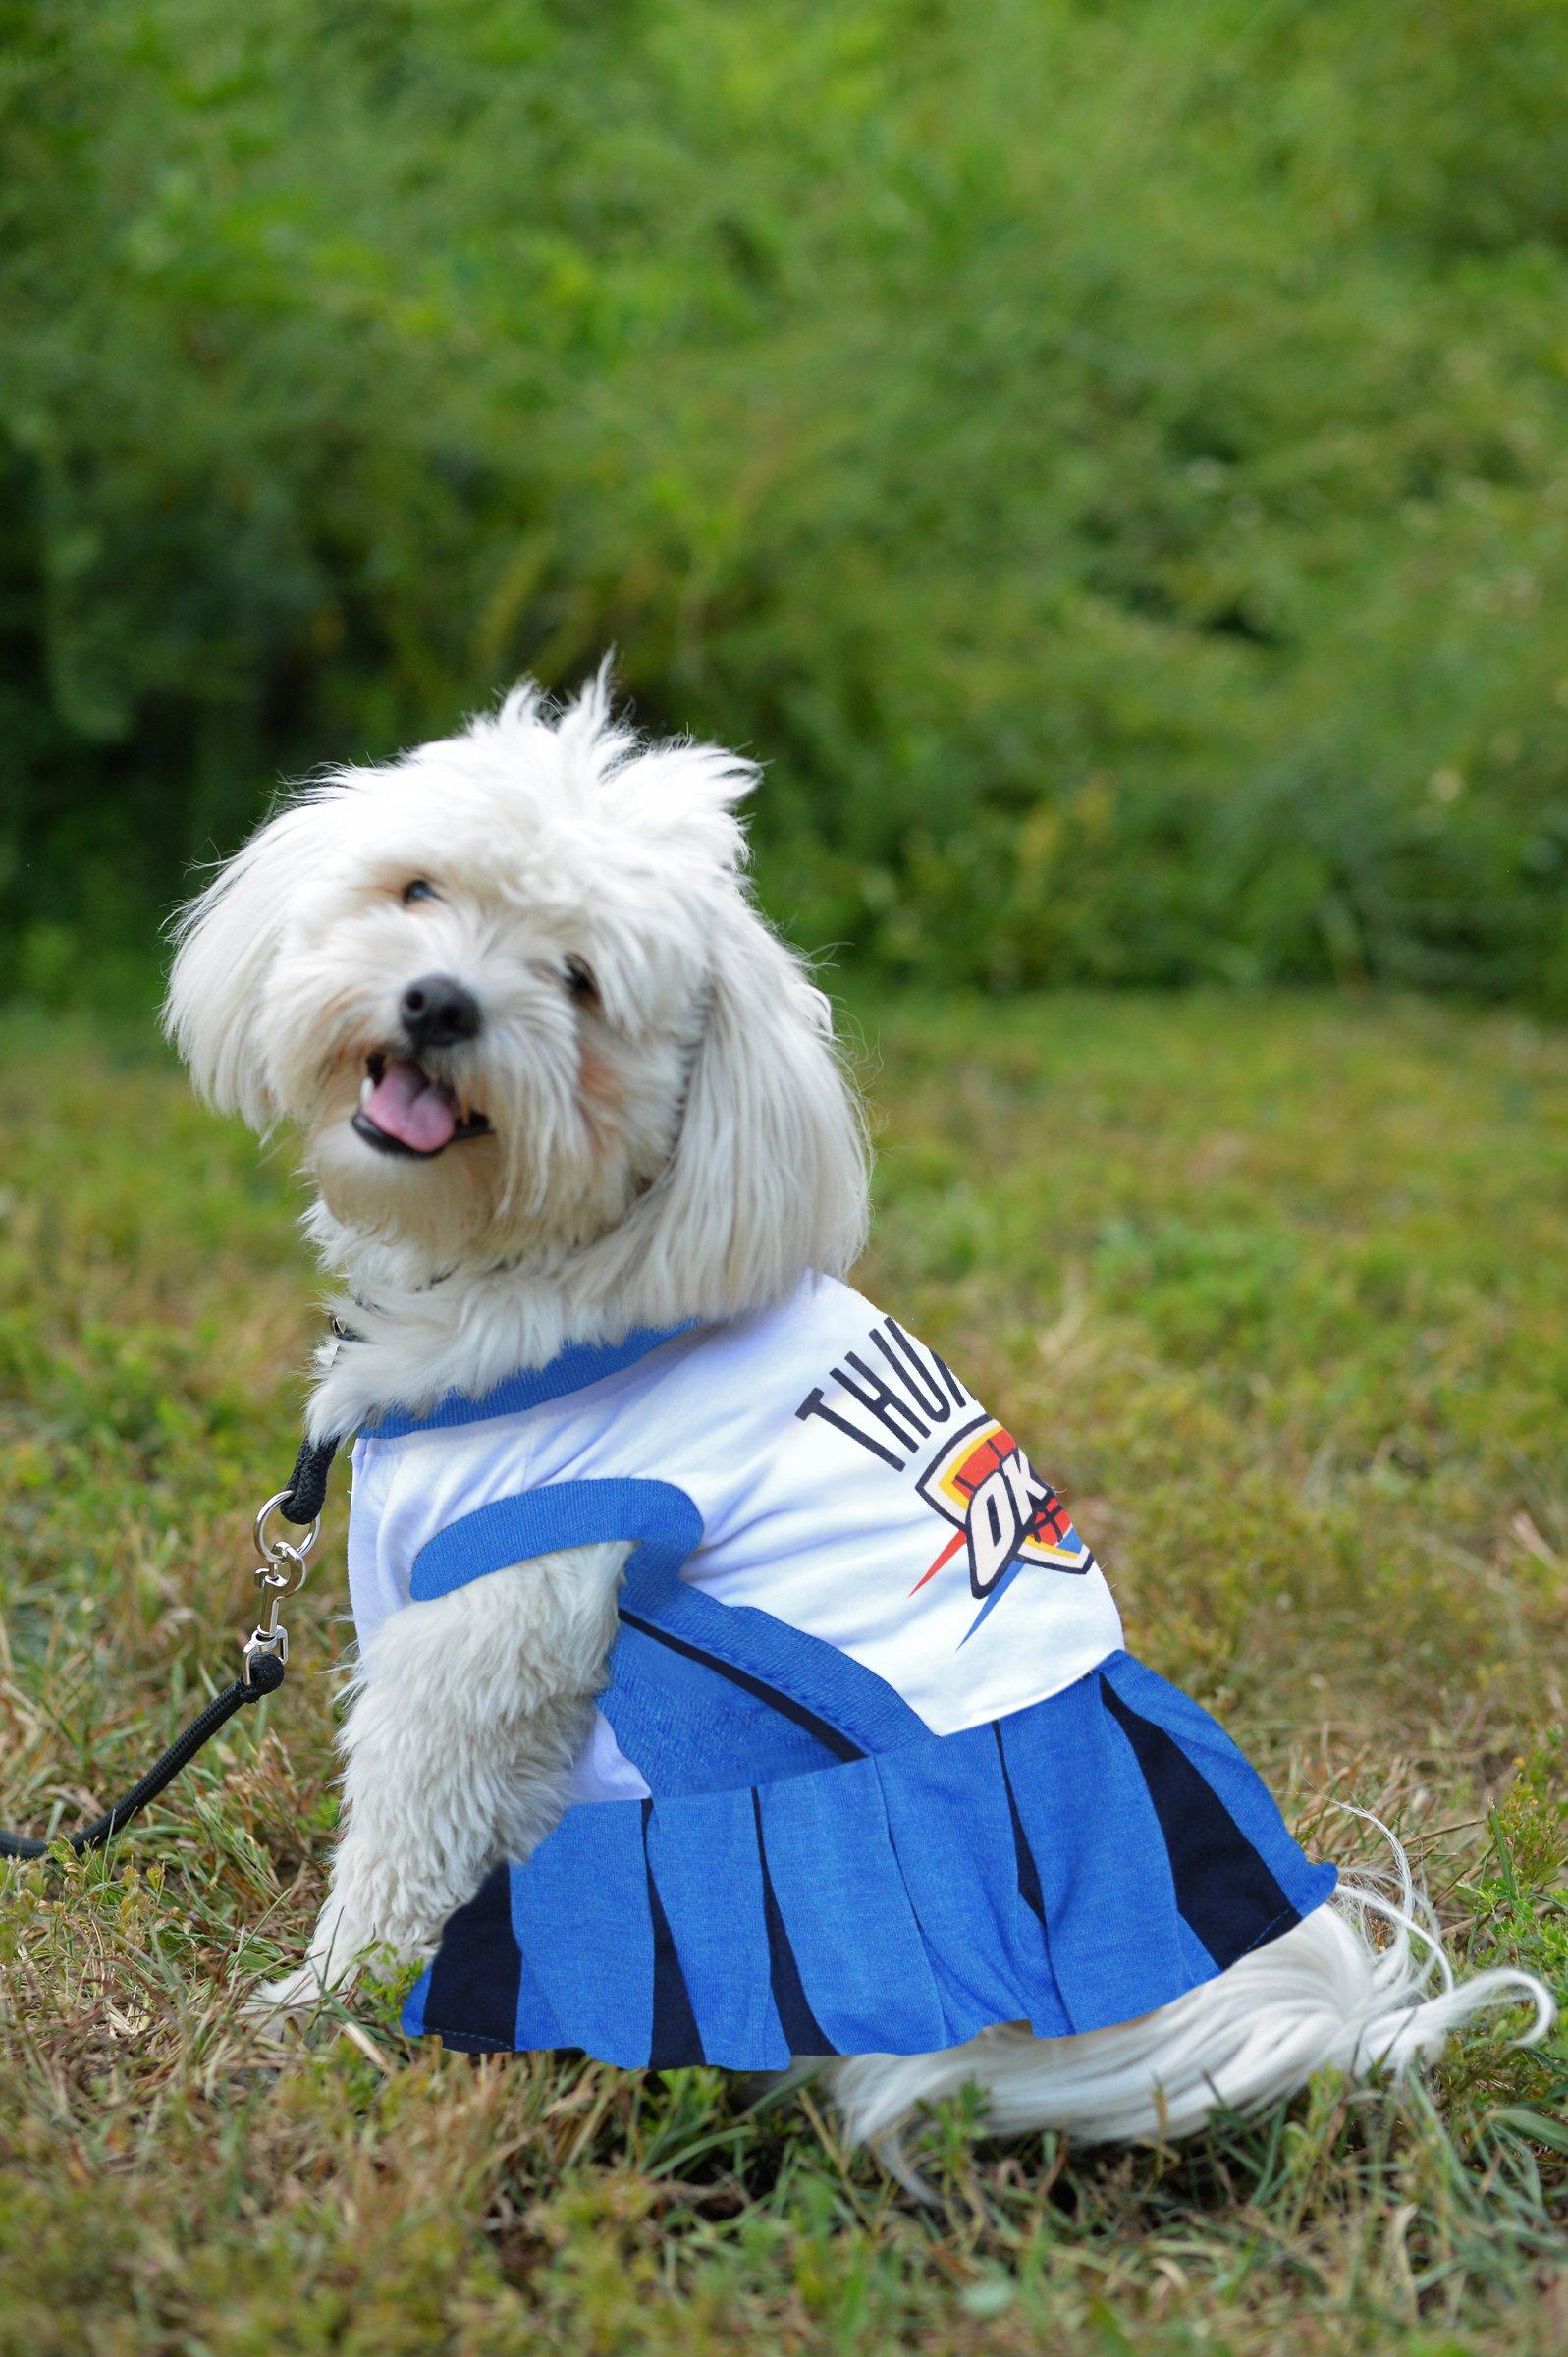 Pets First NBA Oklahoma City Thunder Dog Cheerleader Dress, Medium by Pets First (Image #2)